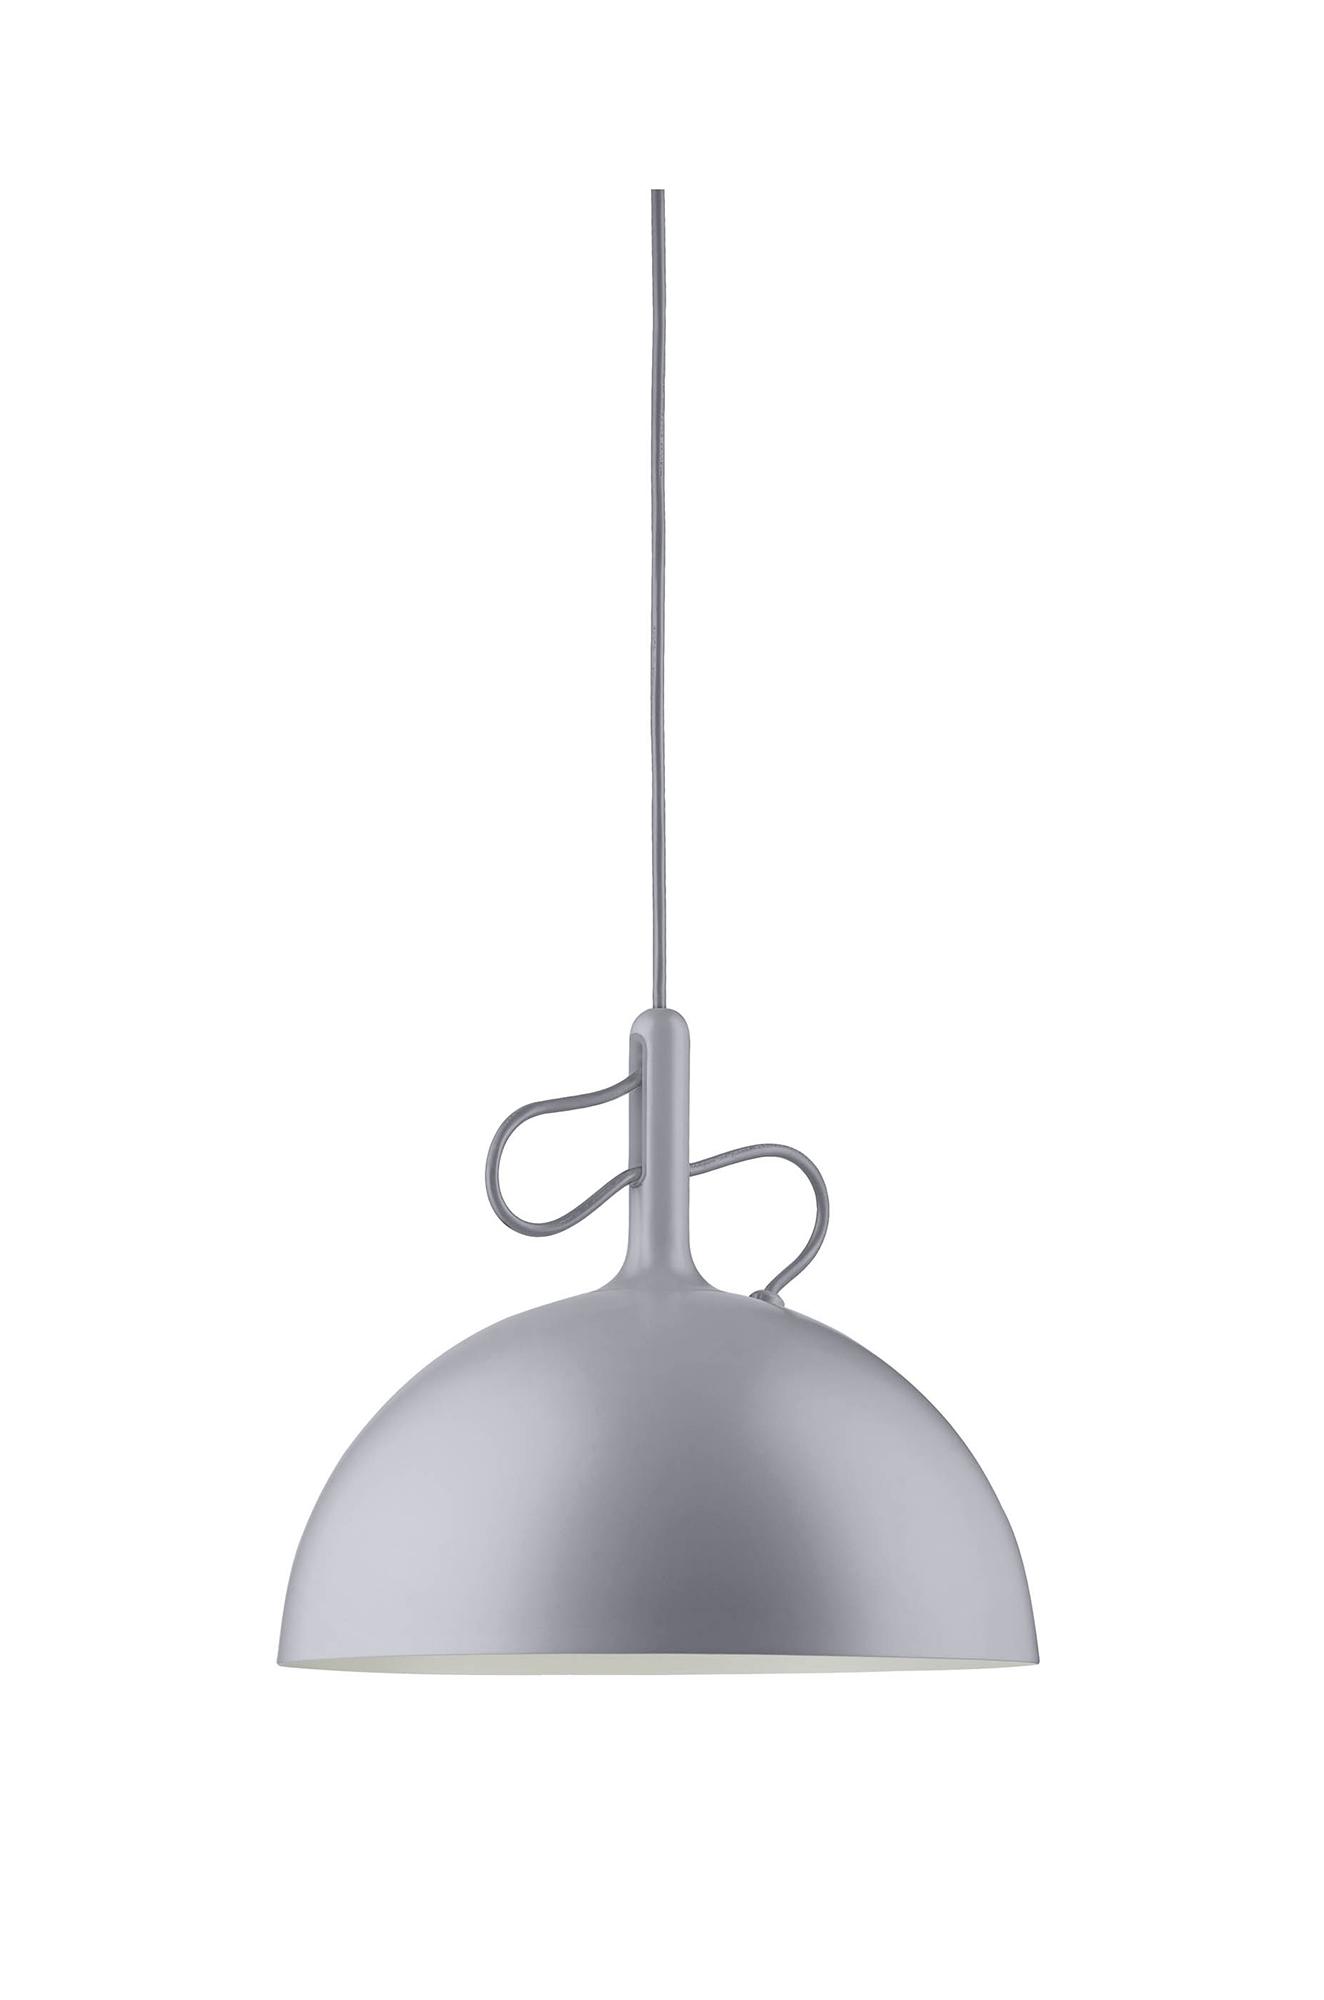 Image of   Adjustable Pendant (Medium Grey) Ø30 cm